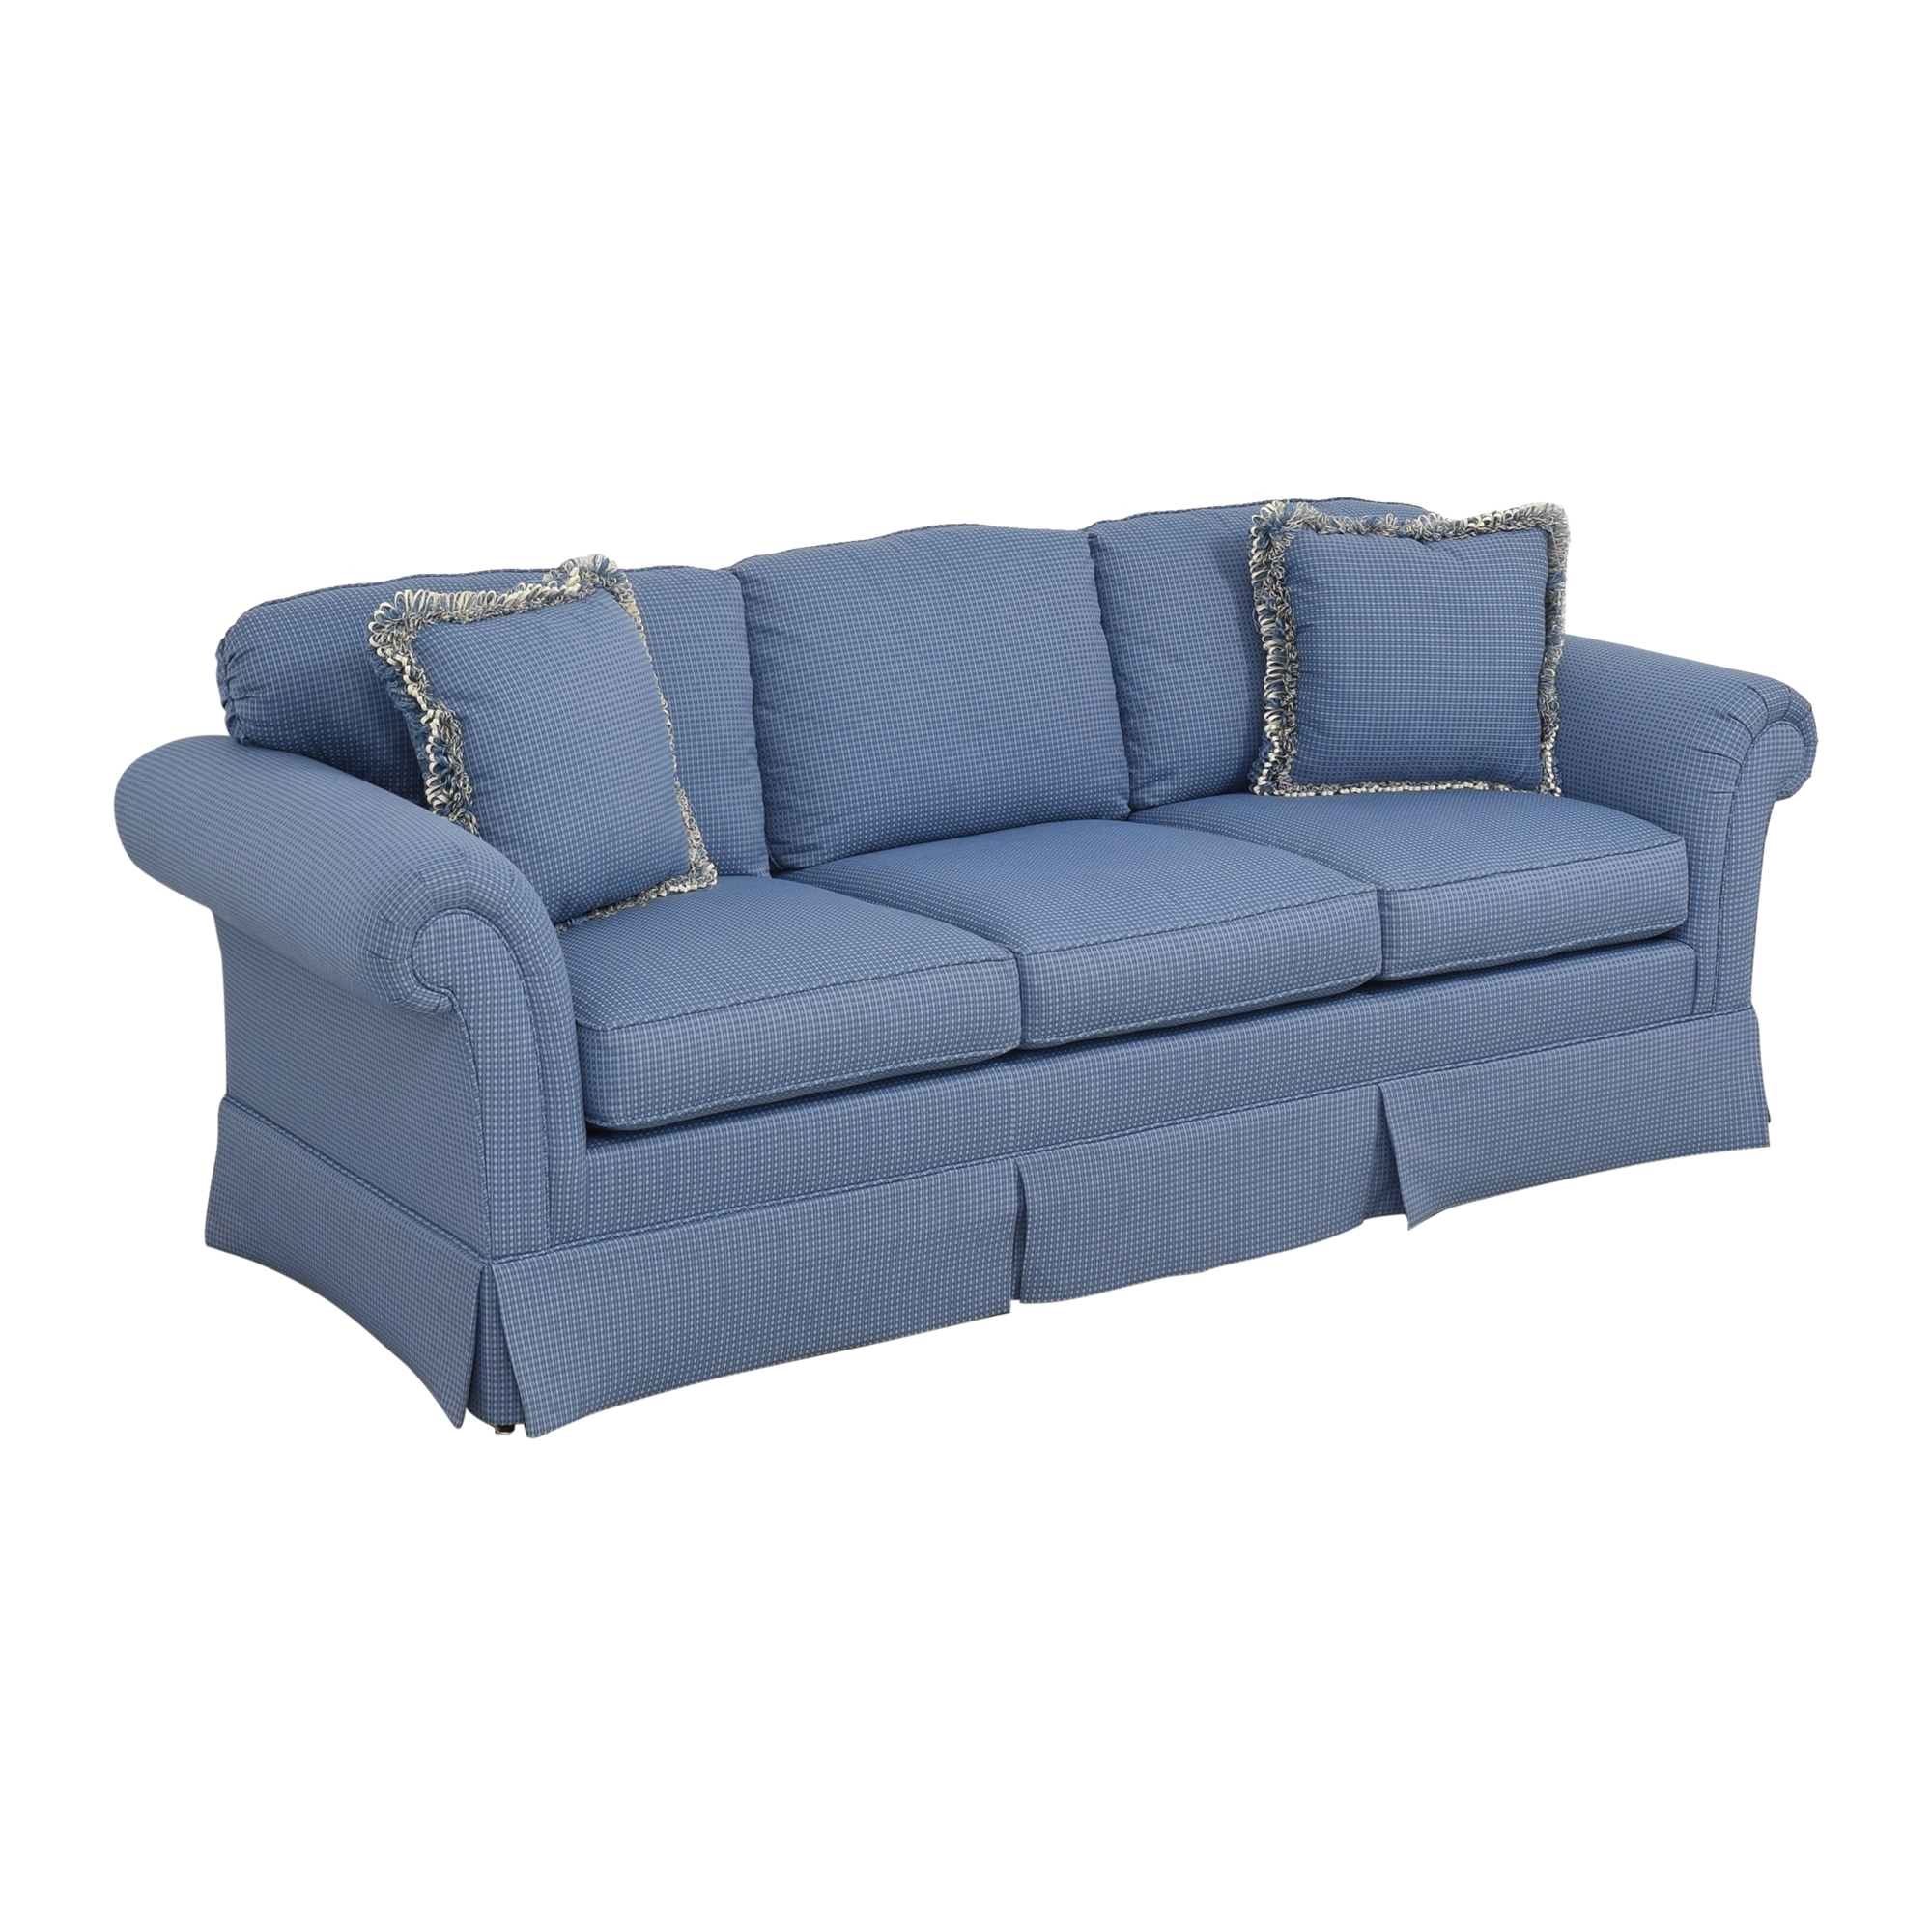 Kindel Kindel Sleigh Arm Sofa for sale